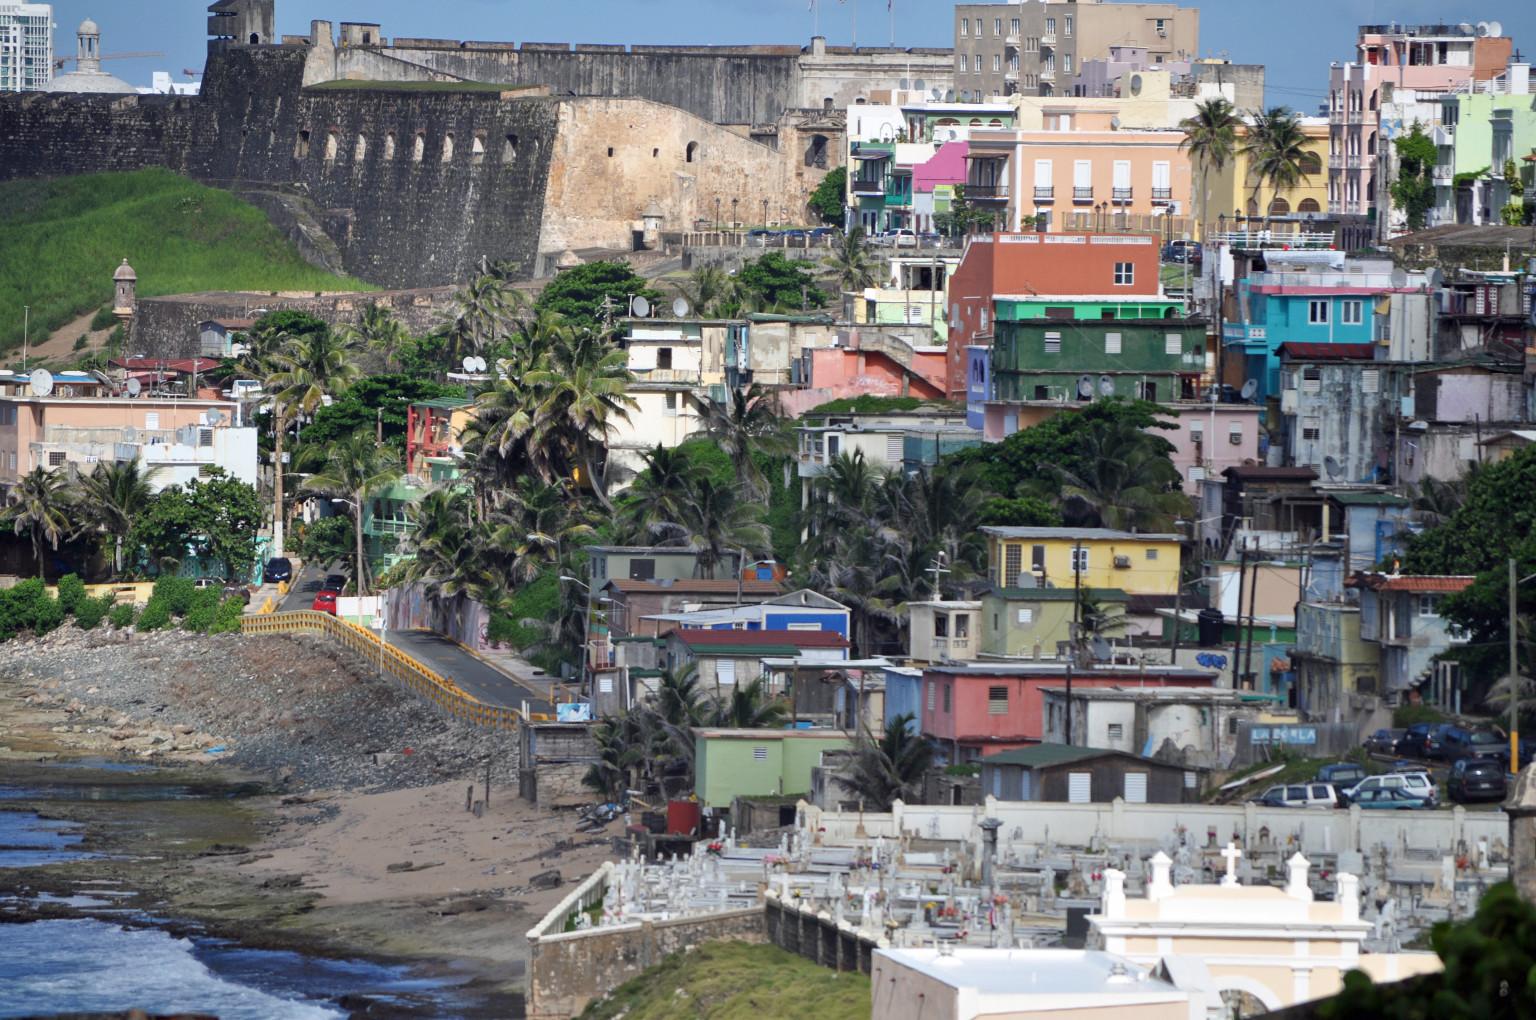 Puerto Rico S Population Drops Due To Shaky Economy